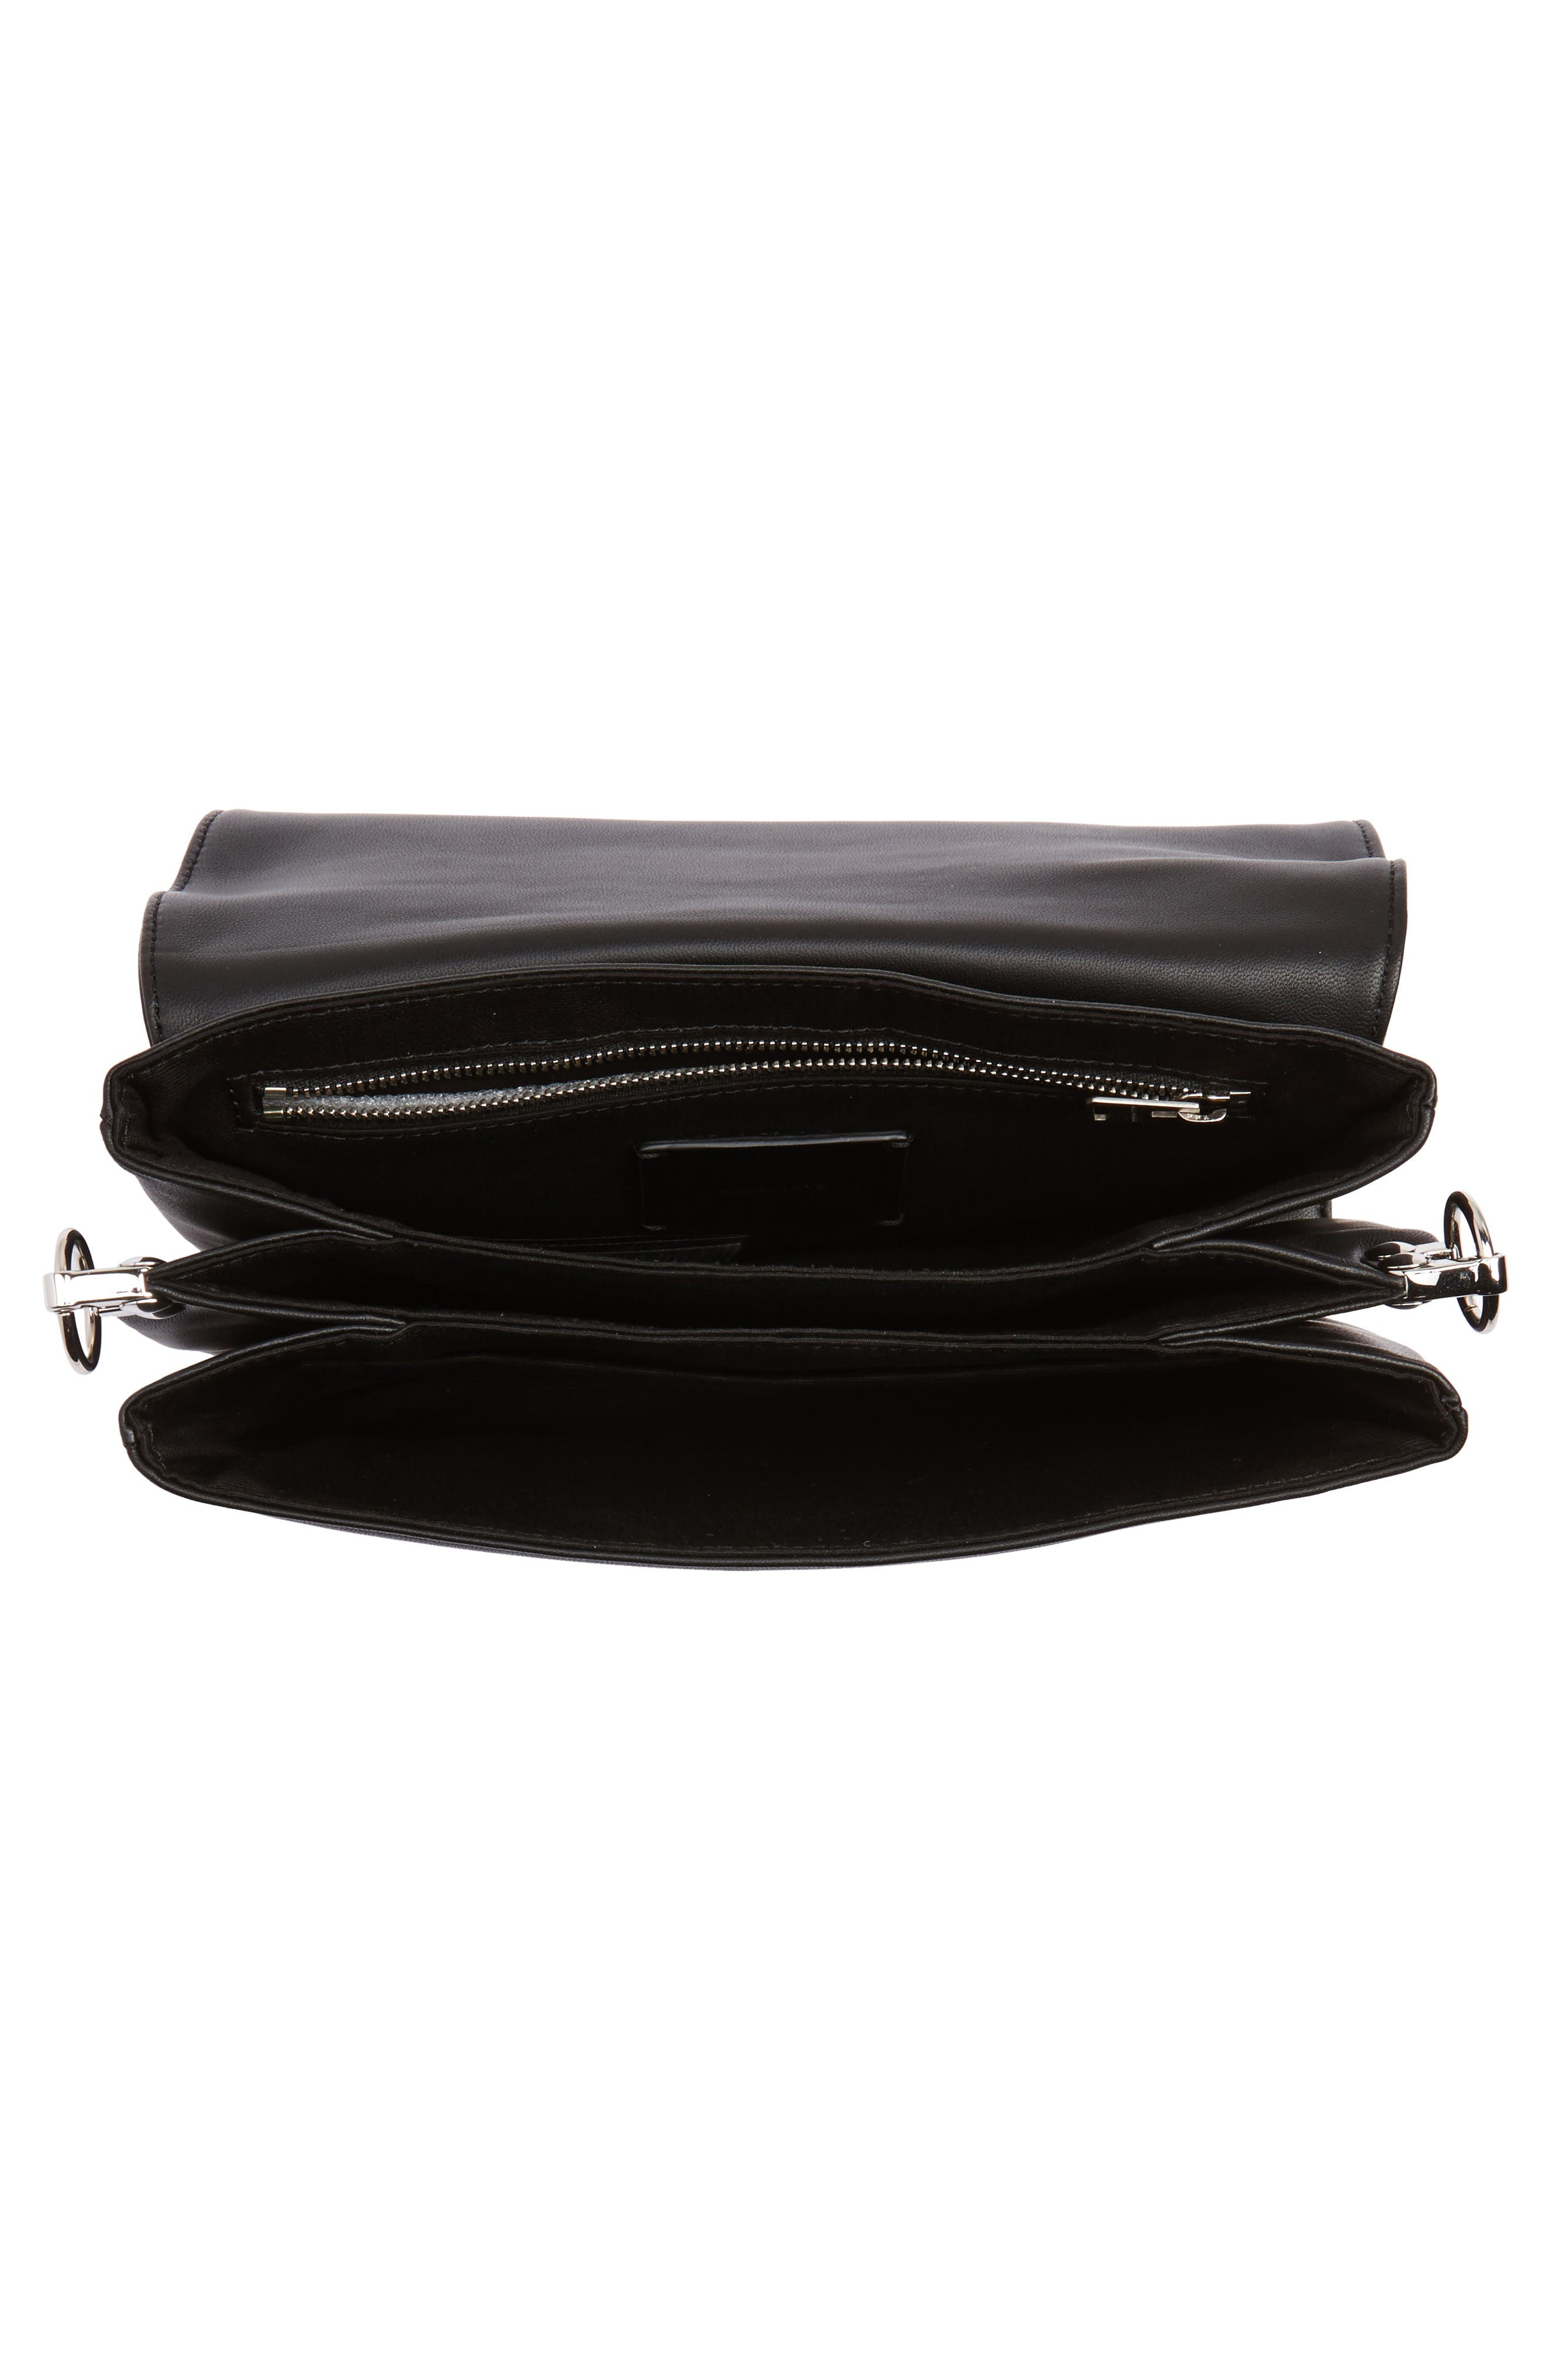 Alternate Image 3  - ALLSAINTS Zep Lambskin Leather Box Bag